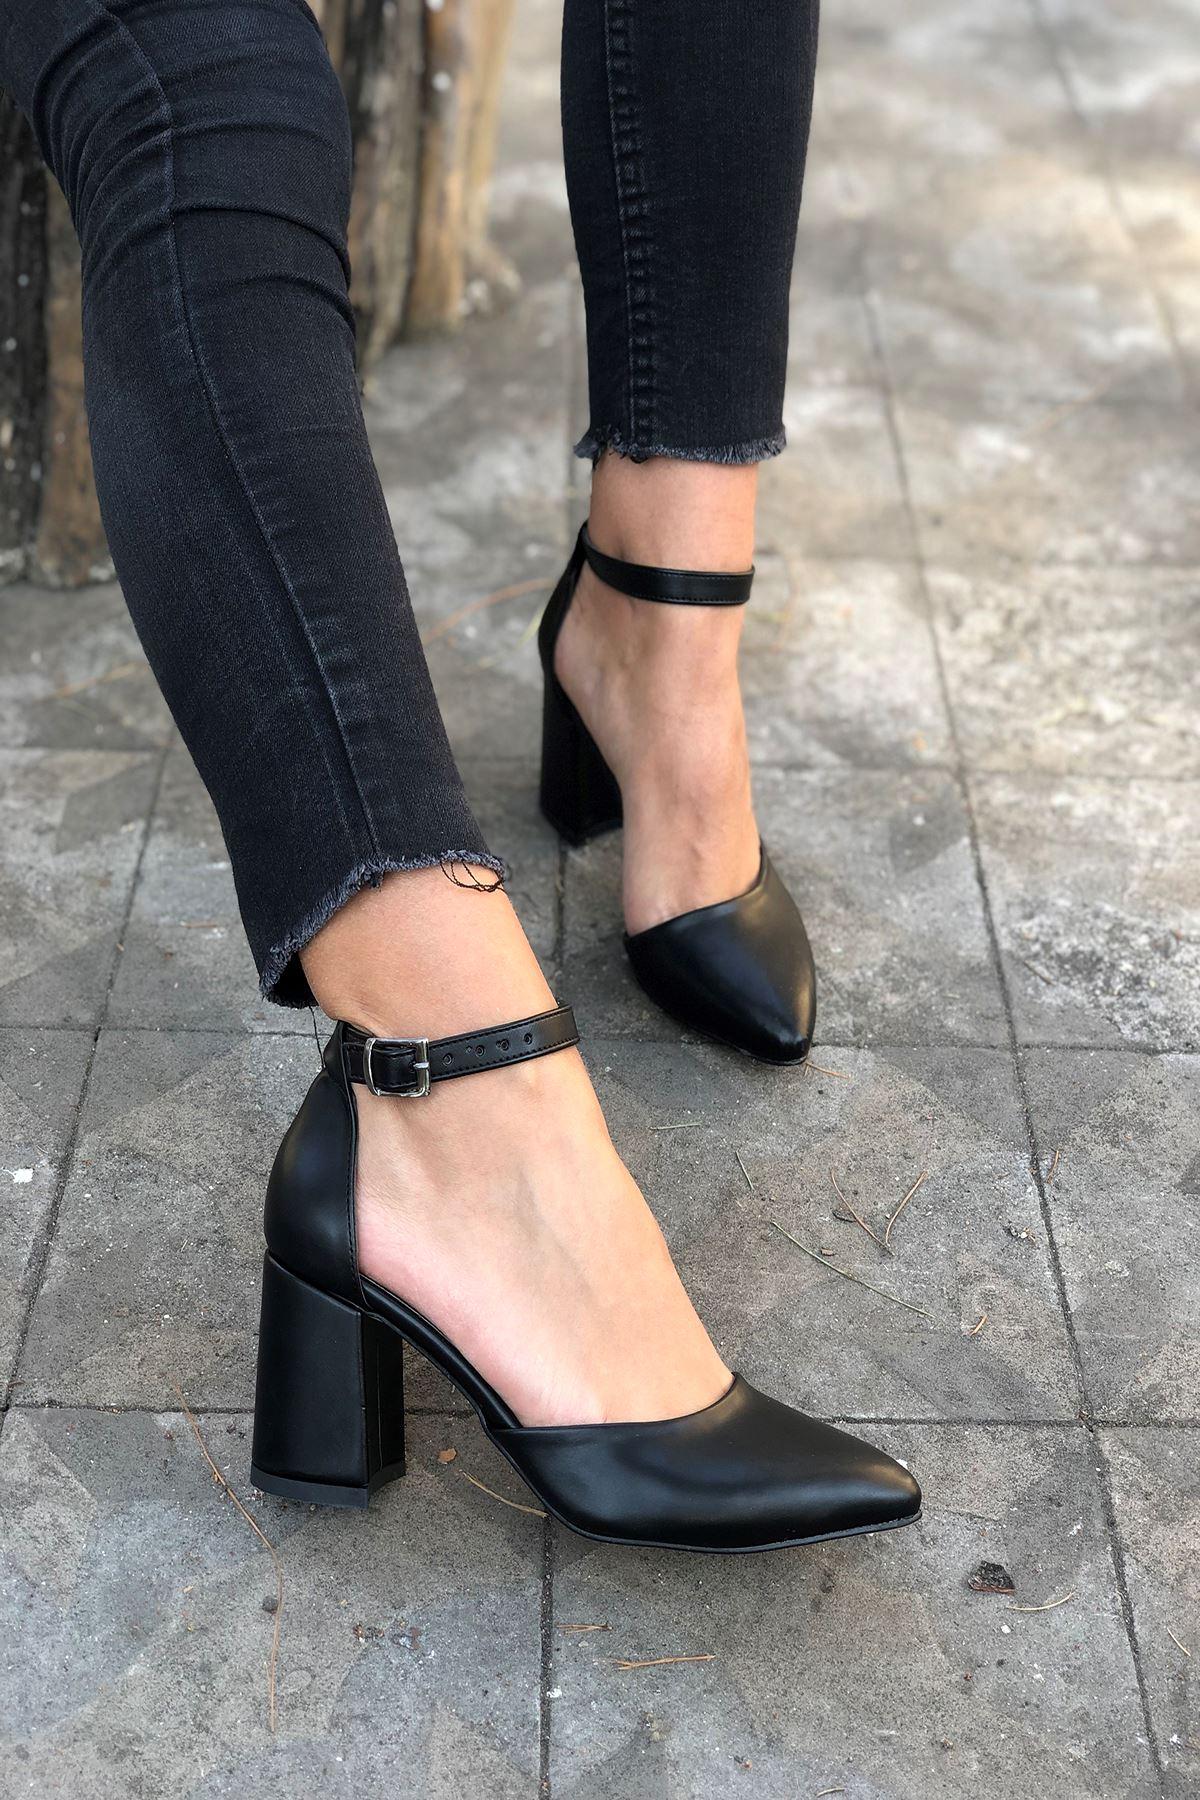 Y102 Siyah Deri Topuklu Ayakkabı